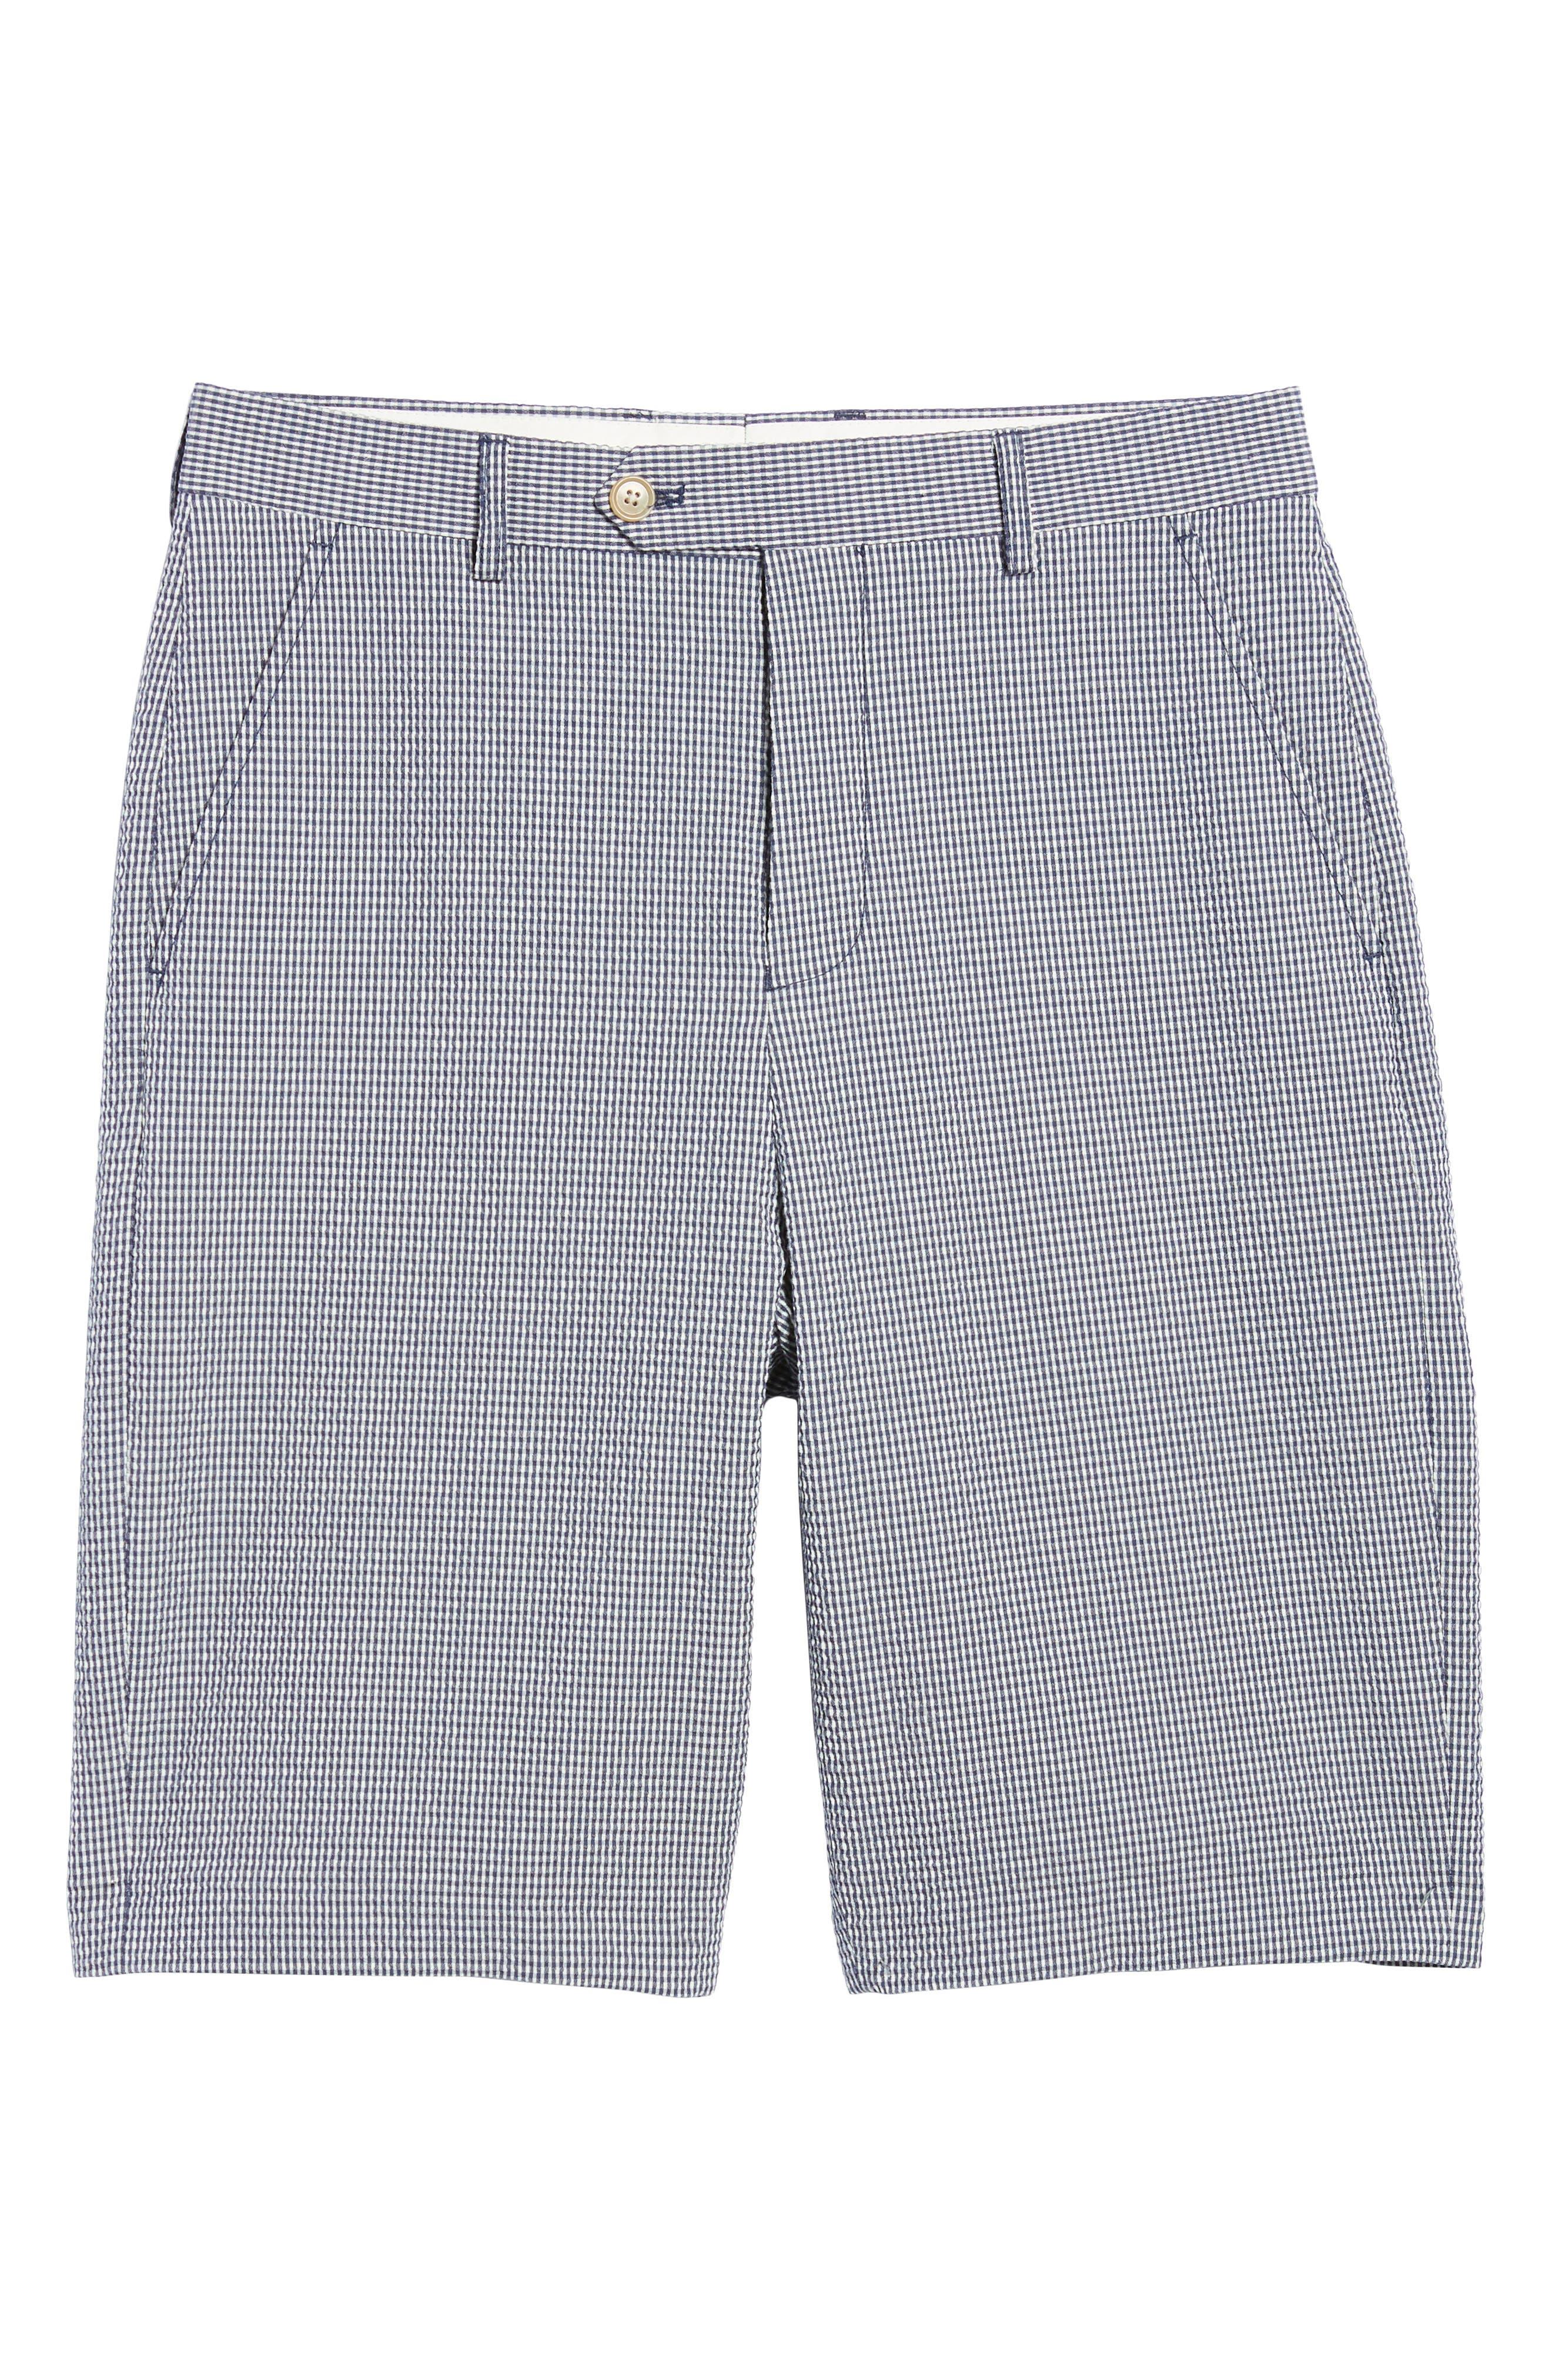 Stretch Seersucker Shorts,                             Alternate thumbnail 6, color,                             Marine Blue